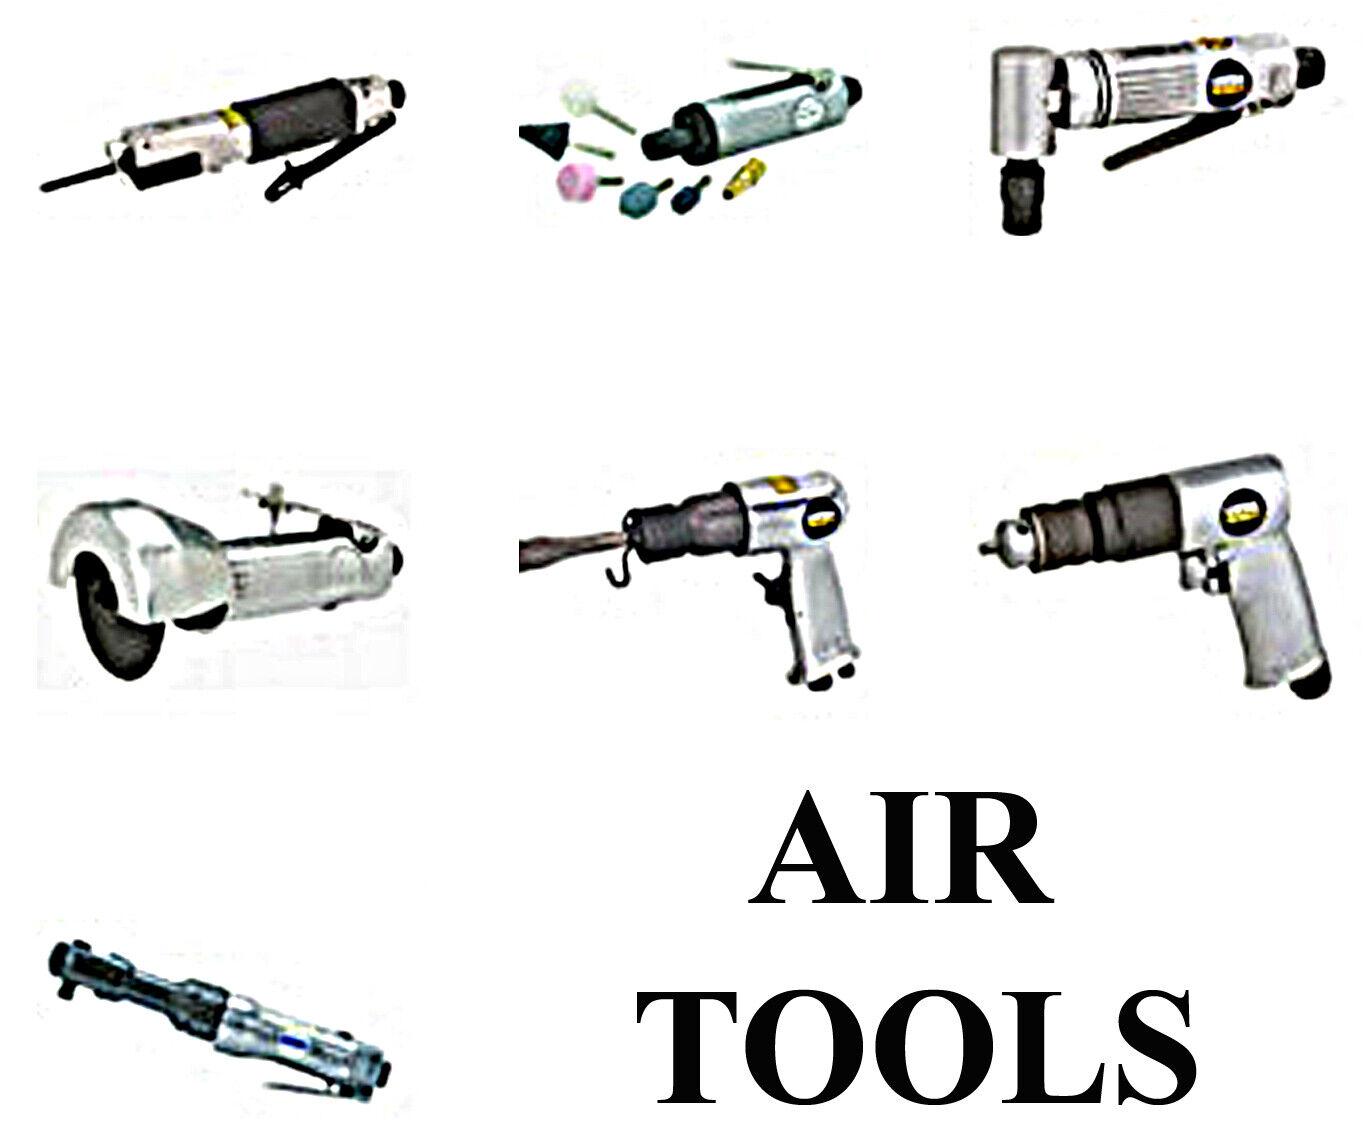 AIR Power Tools, Grinders Hammers Drills Cutoffs Saws Harbor